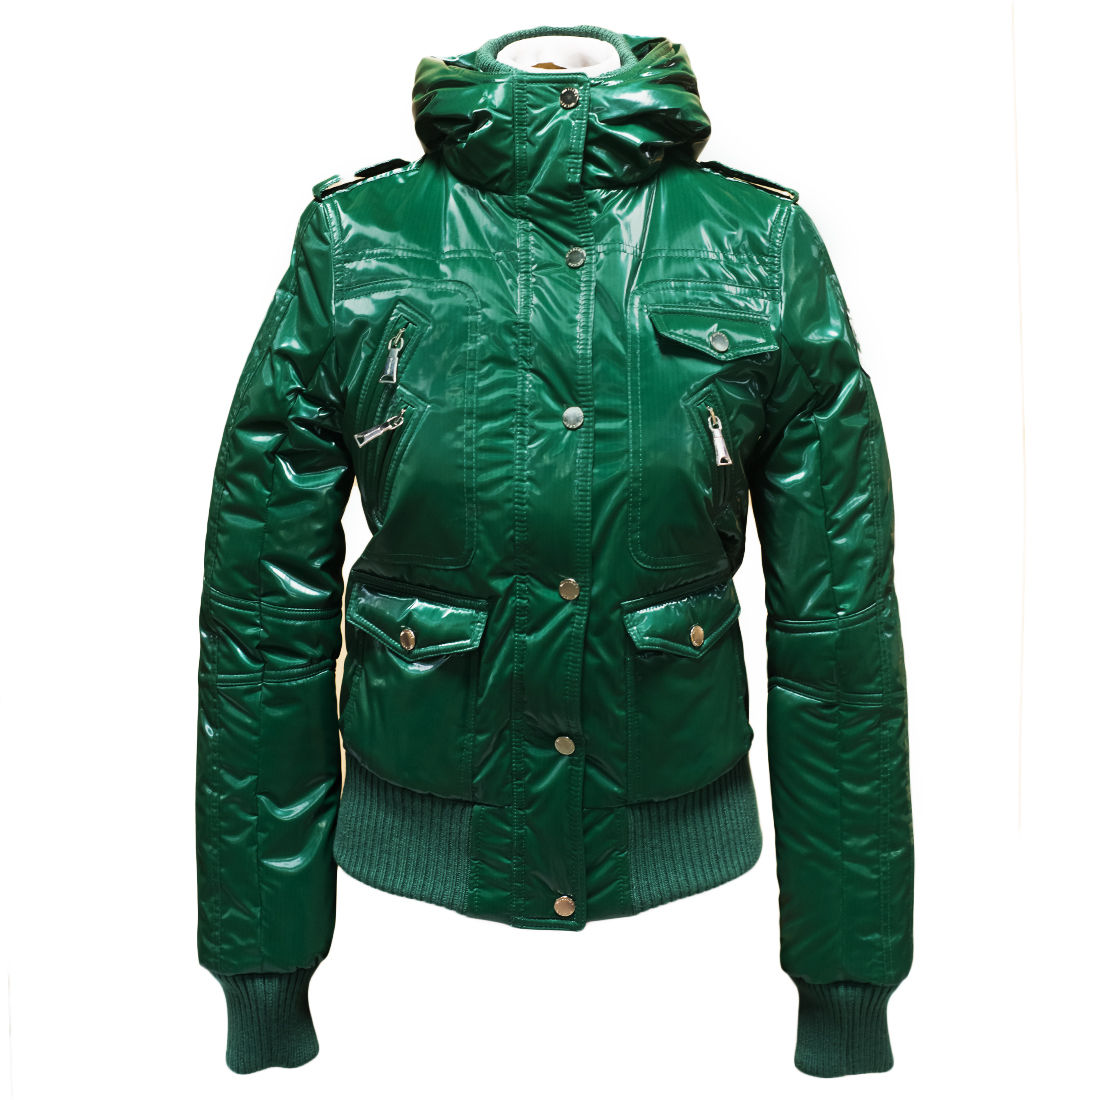 Arlene Verde Minta Mint Green Padded Women's Bomber Hoodie Jacket